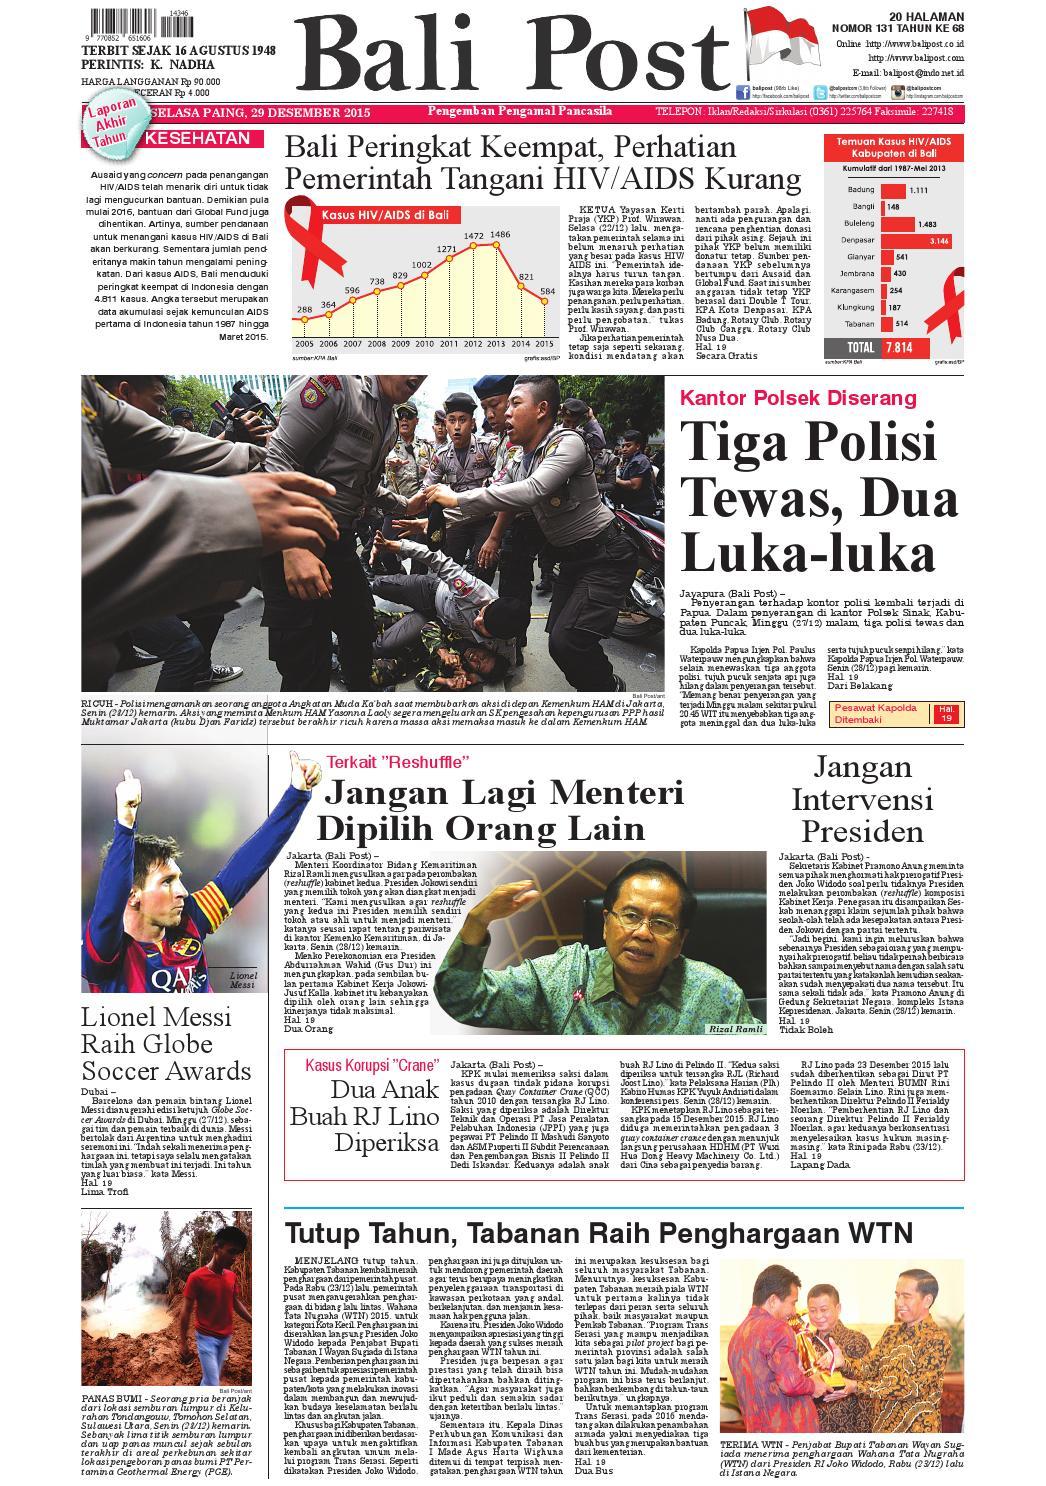 Edisi 29 Desember 2015 Balipostcom By E Paper Kmb Issuu Penutup Toilet Duduk Otomatis Izen Ib 450